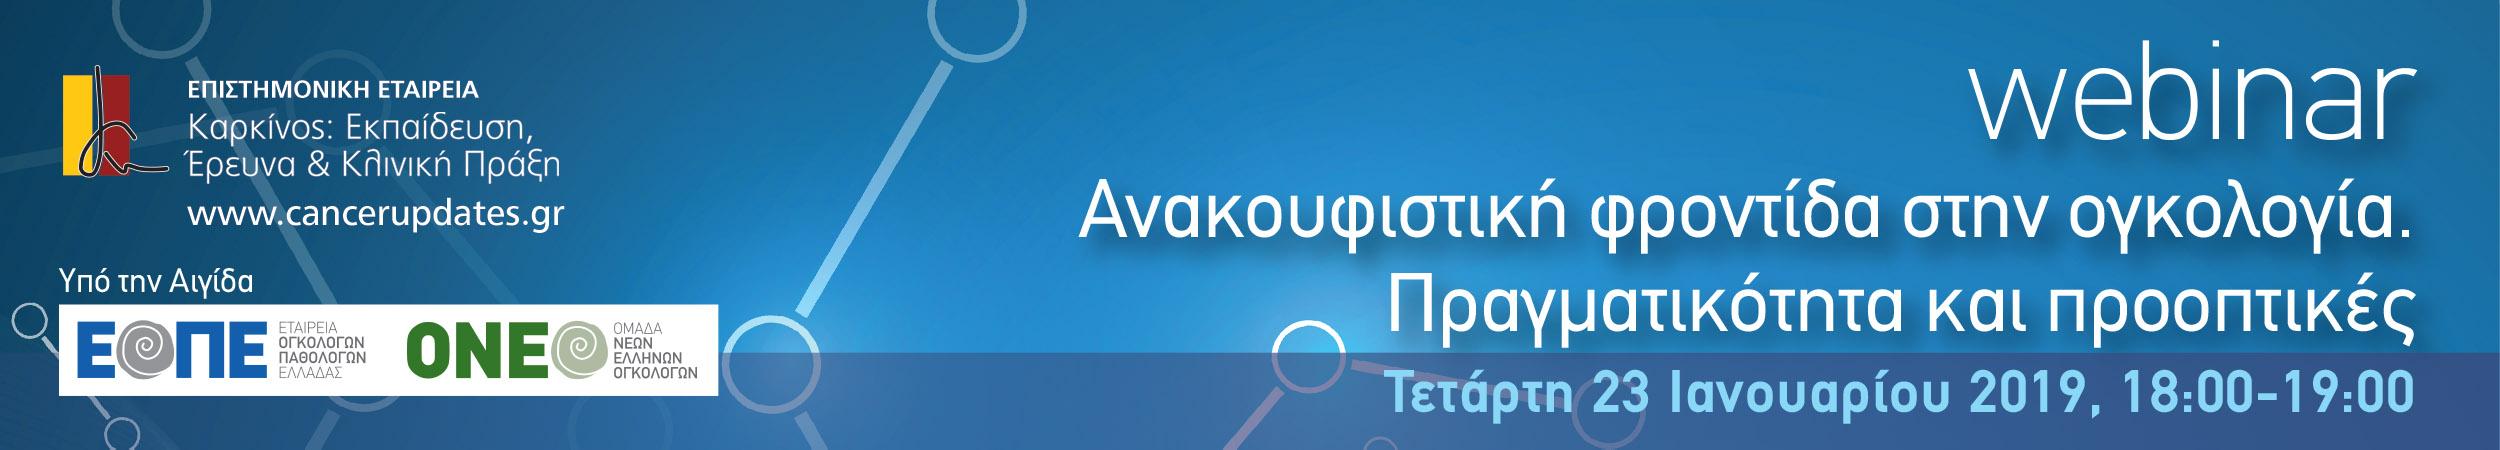 2500_anakoufistiki18